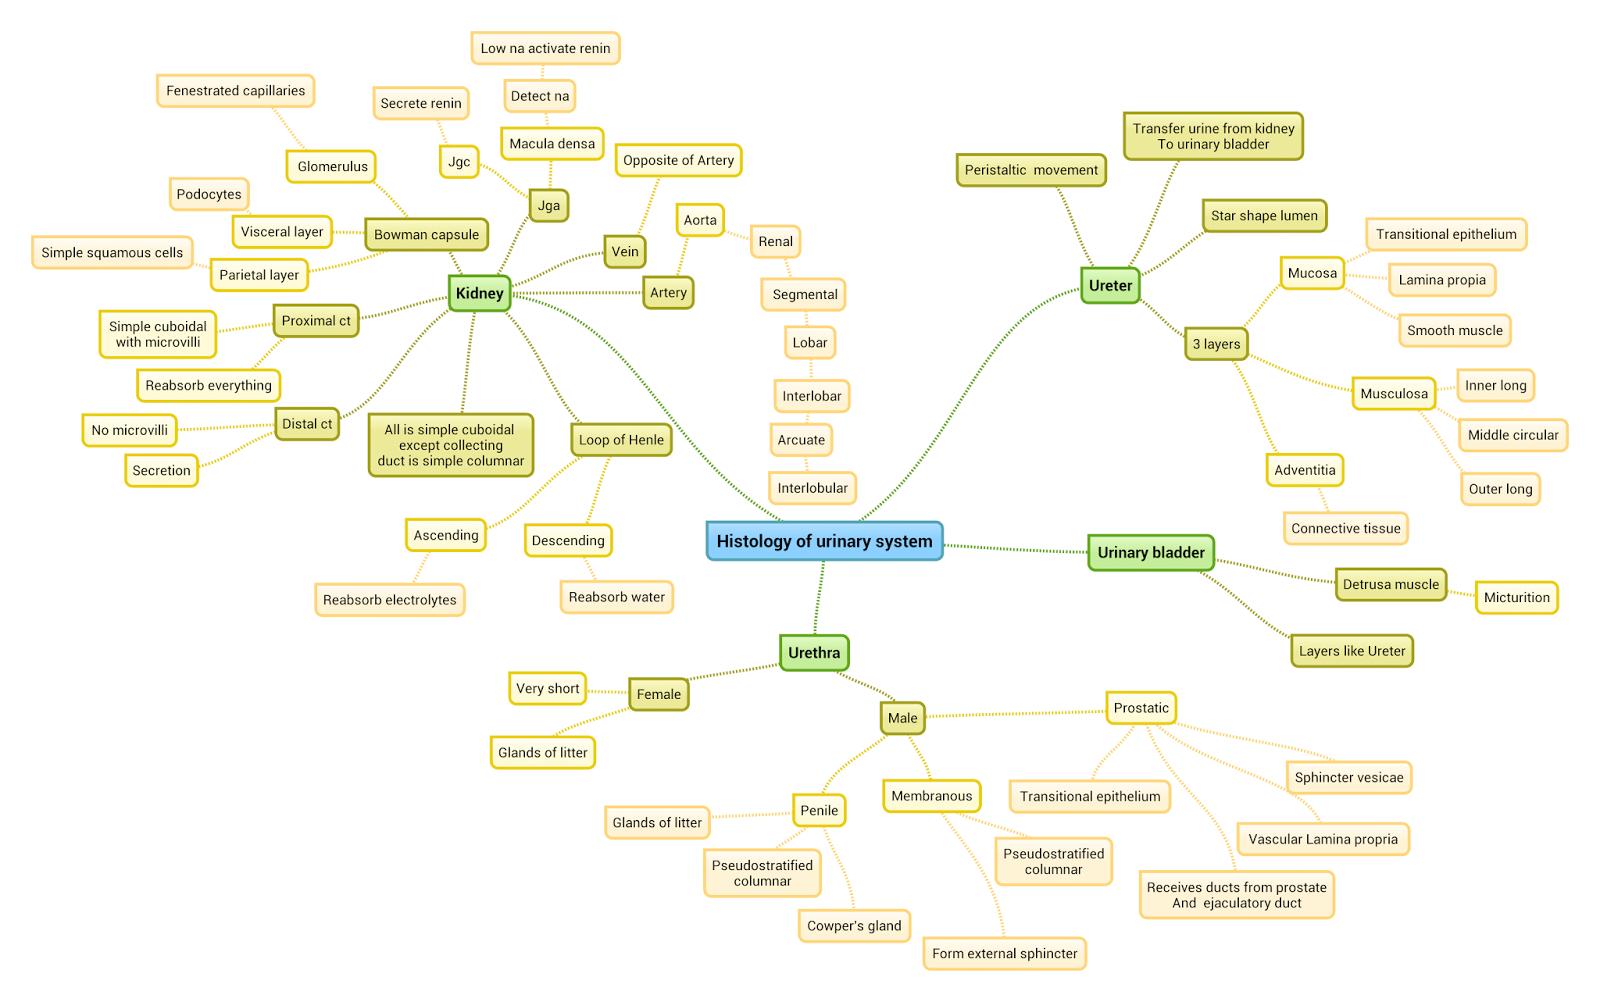 nervous system concept map html nervous usa states map collections. Black Bedroom Furniture Sets. Home Design Ideas